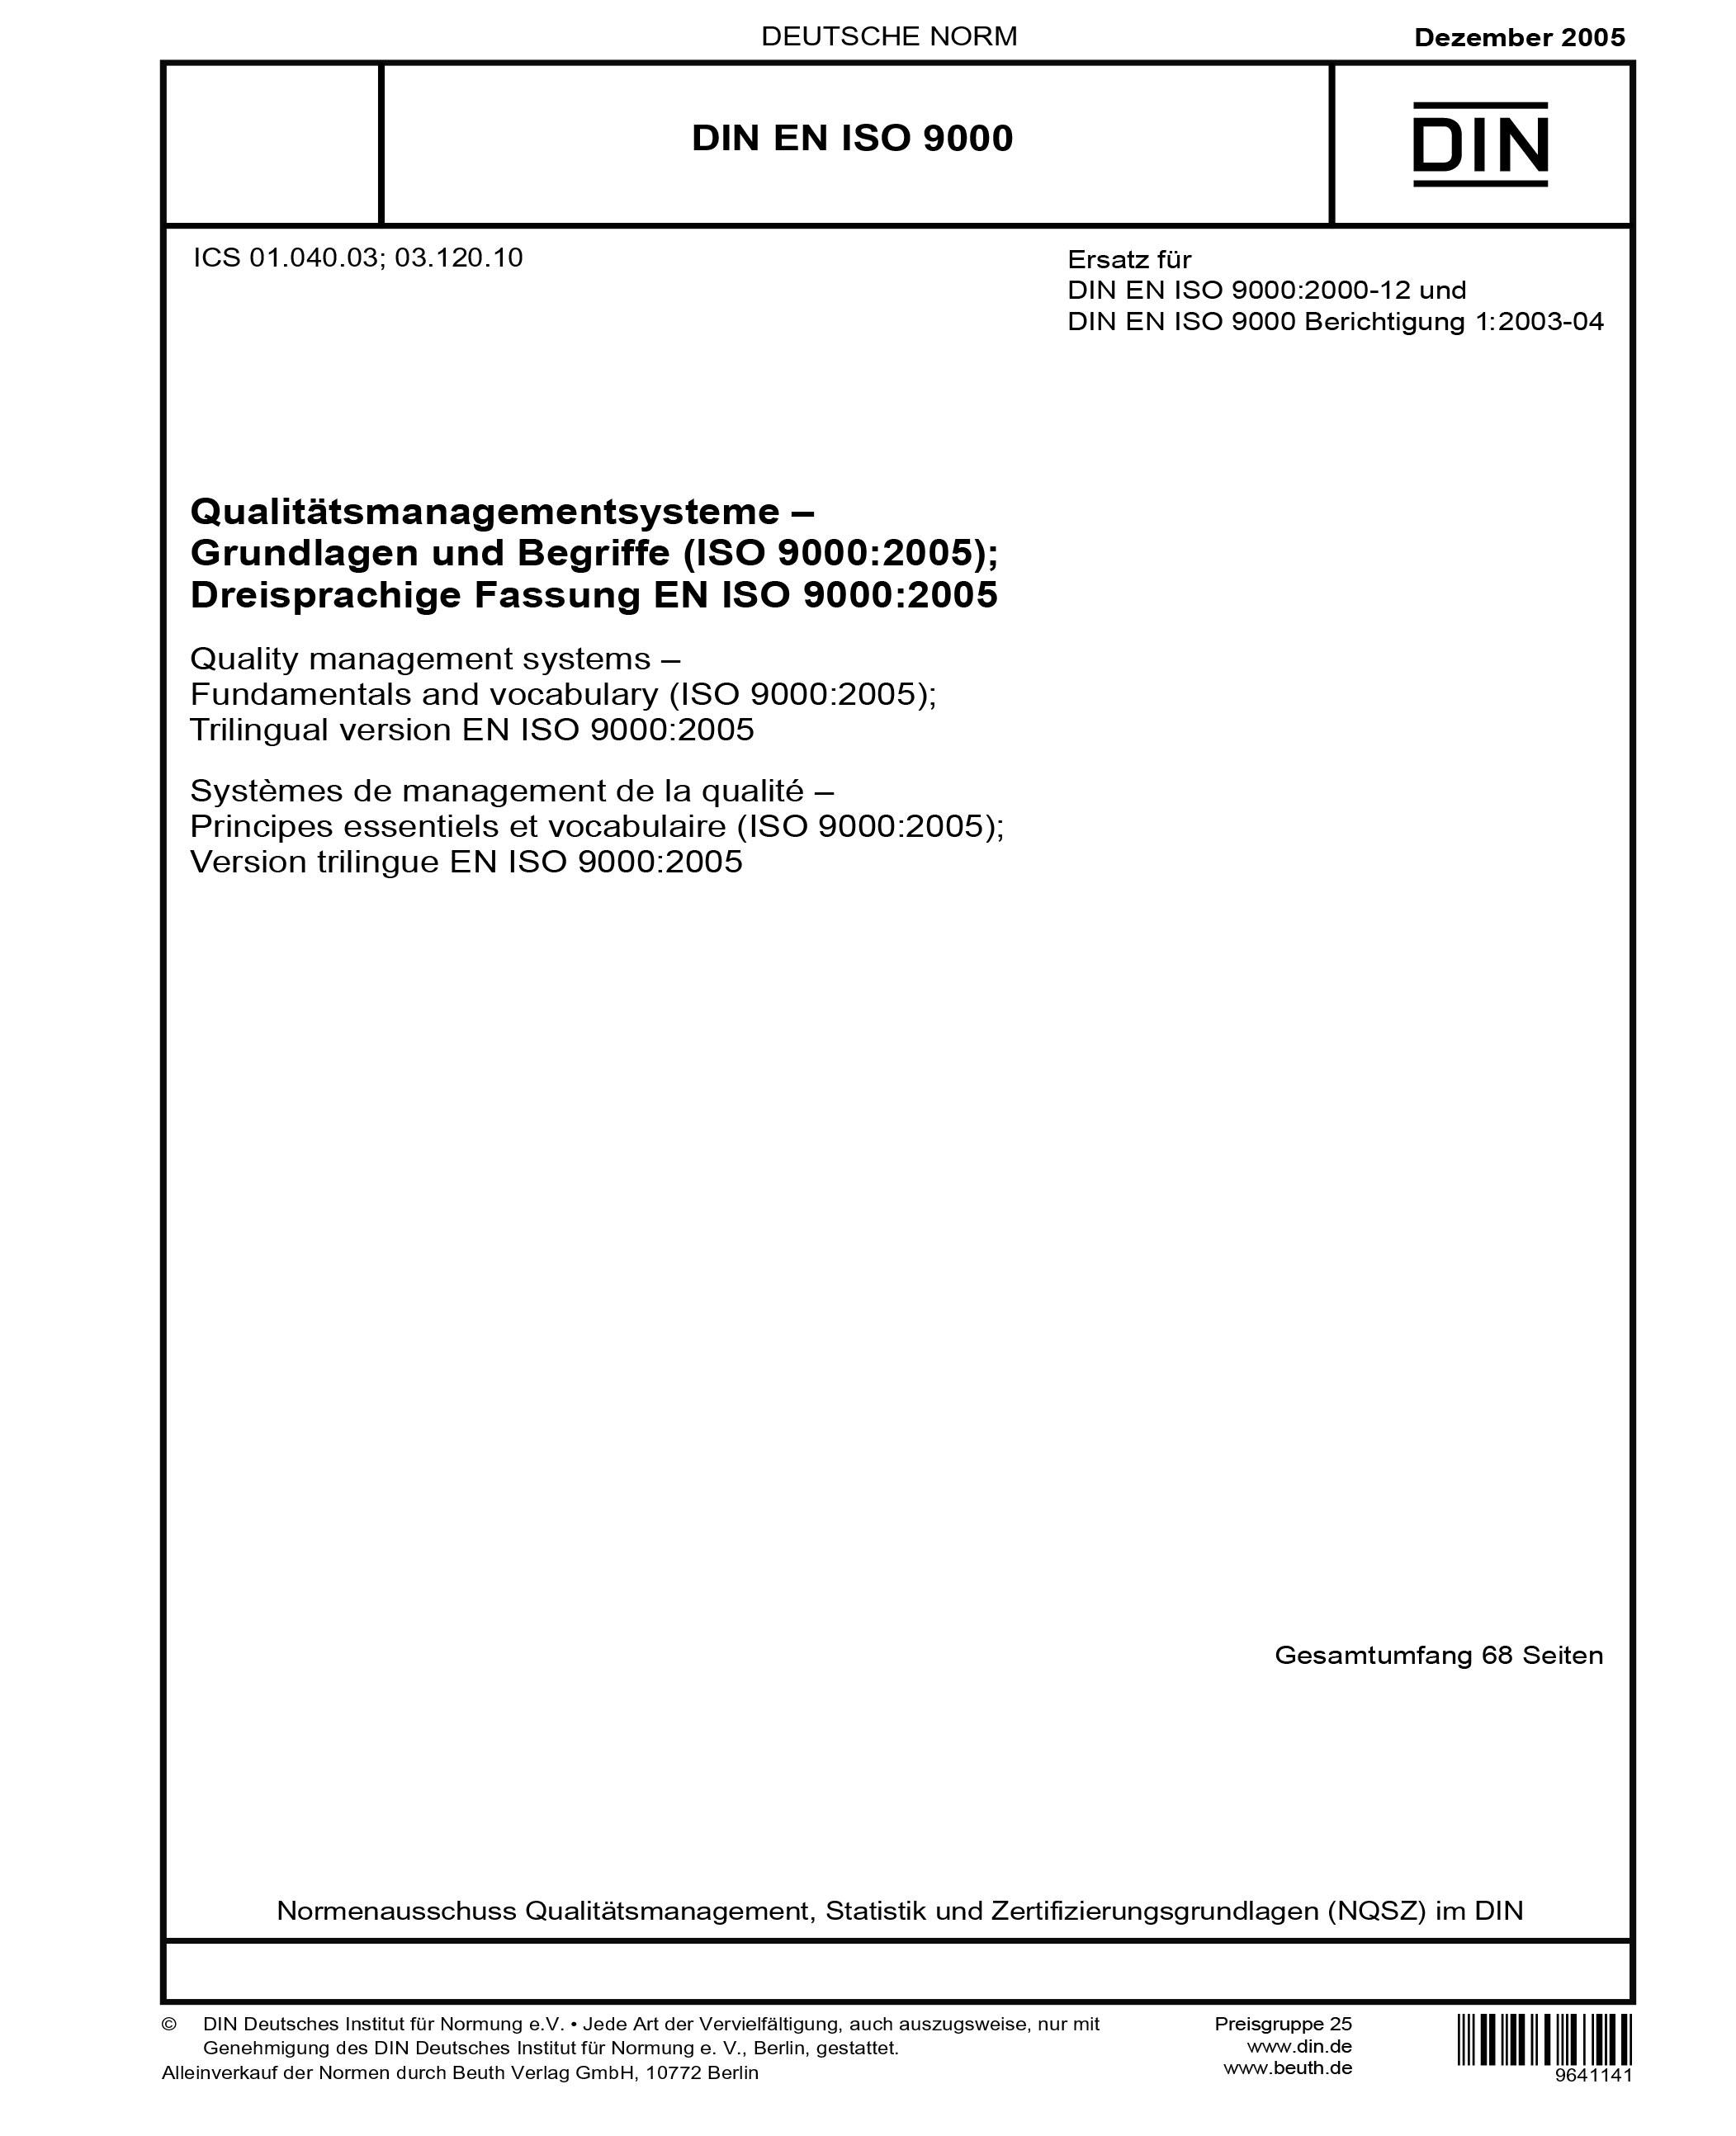 iso 9000 version 2005 pdf español